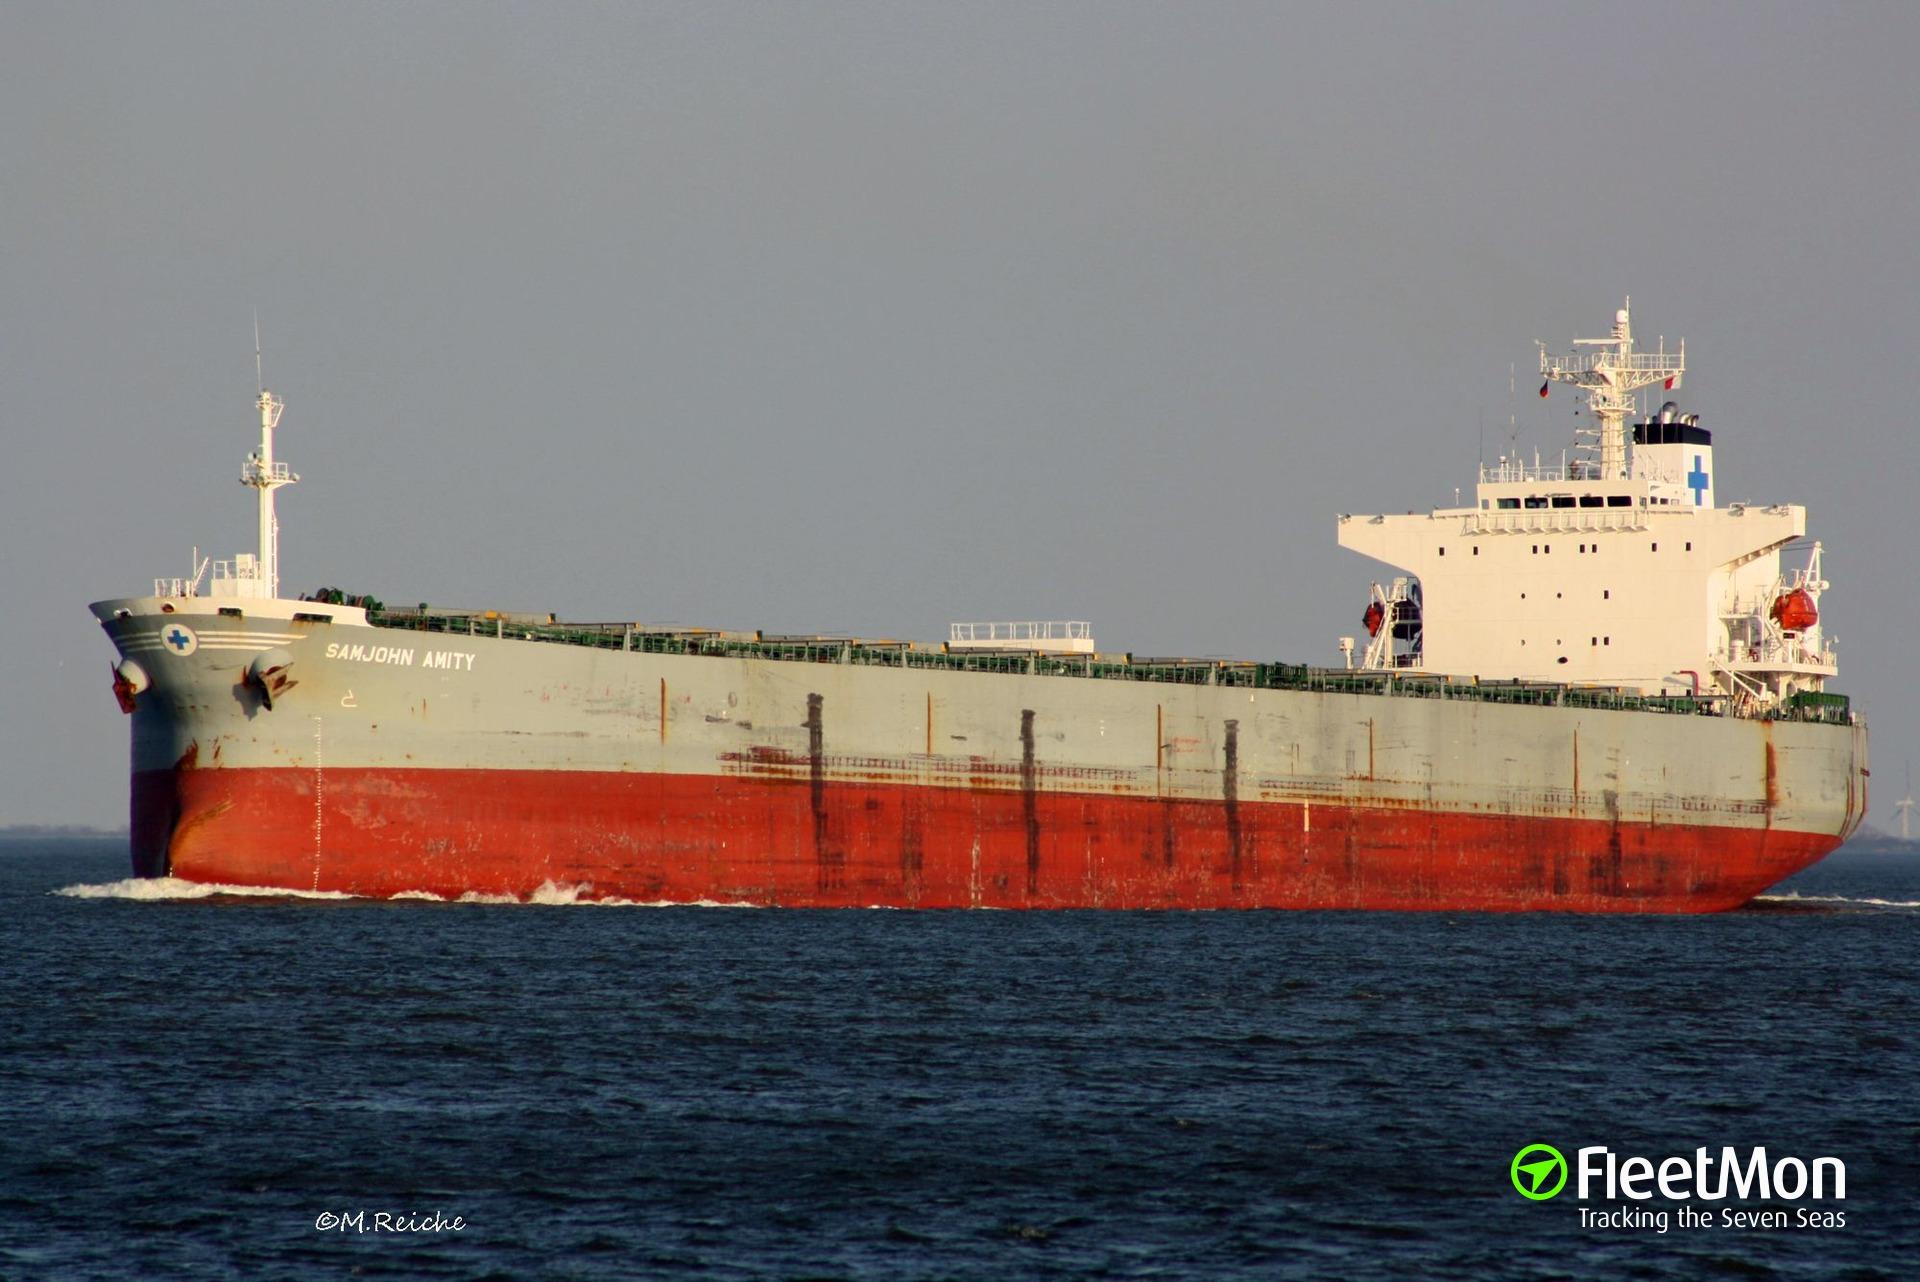 Chief Engineer of bulker SAMJOHN AMITY missing, Brazil